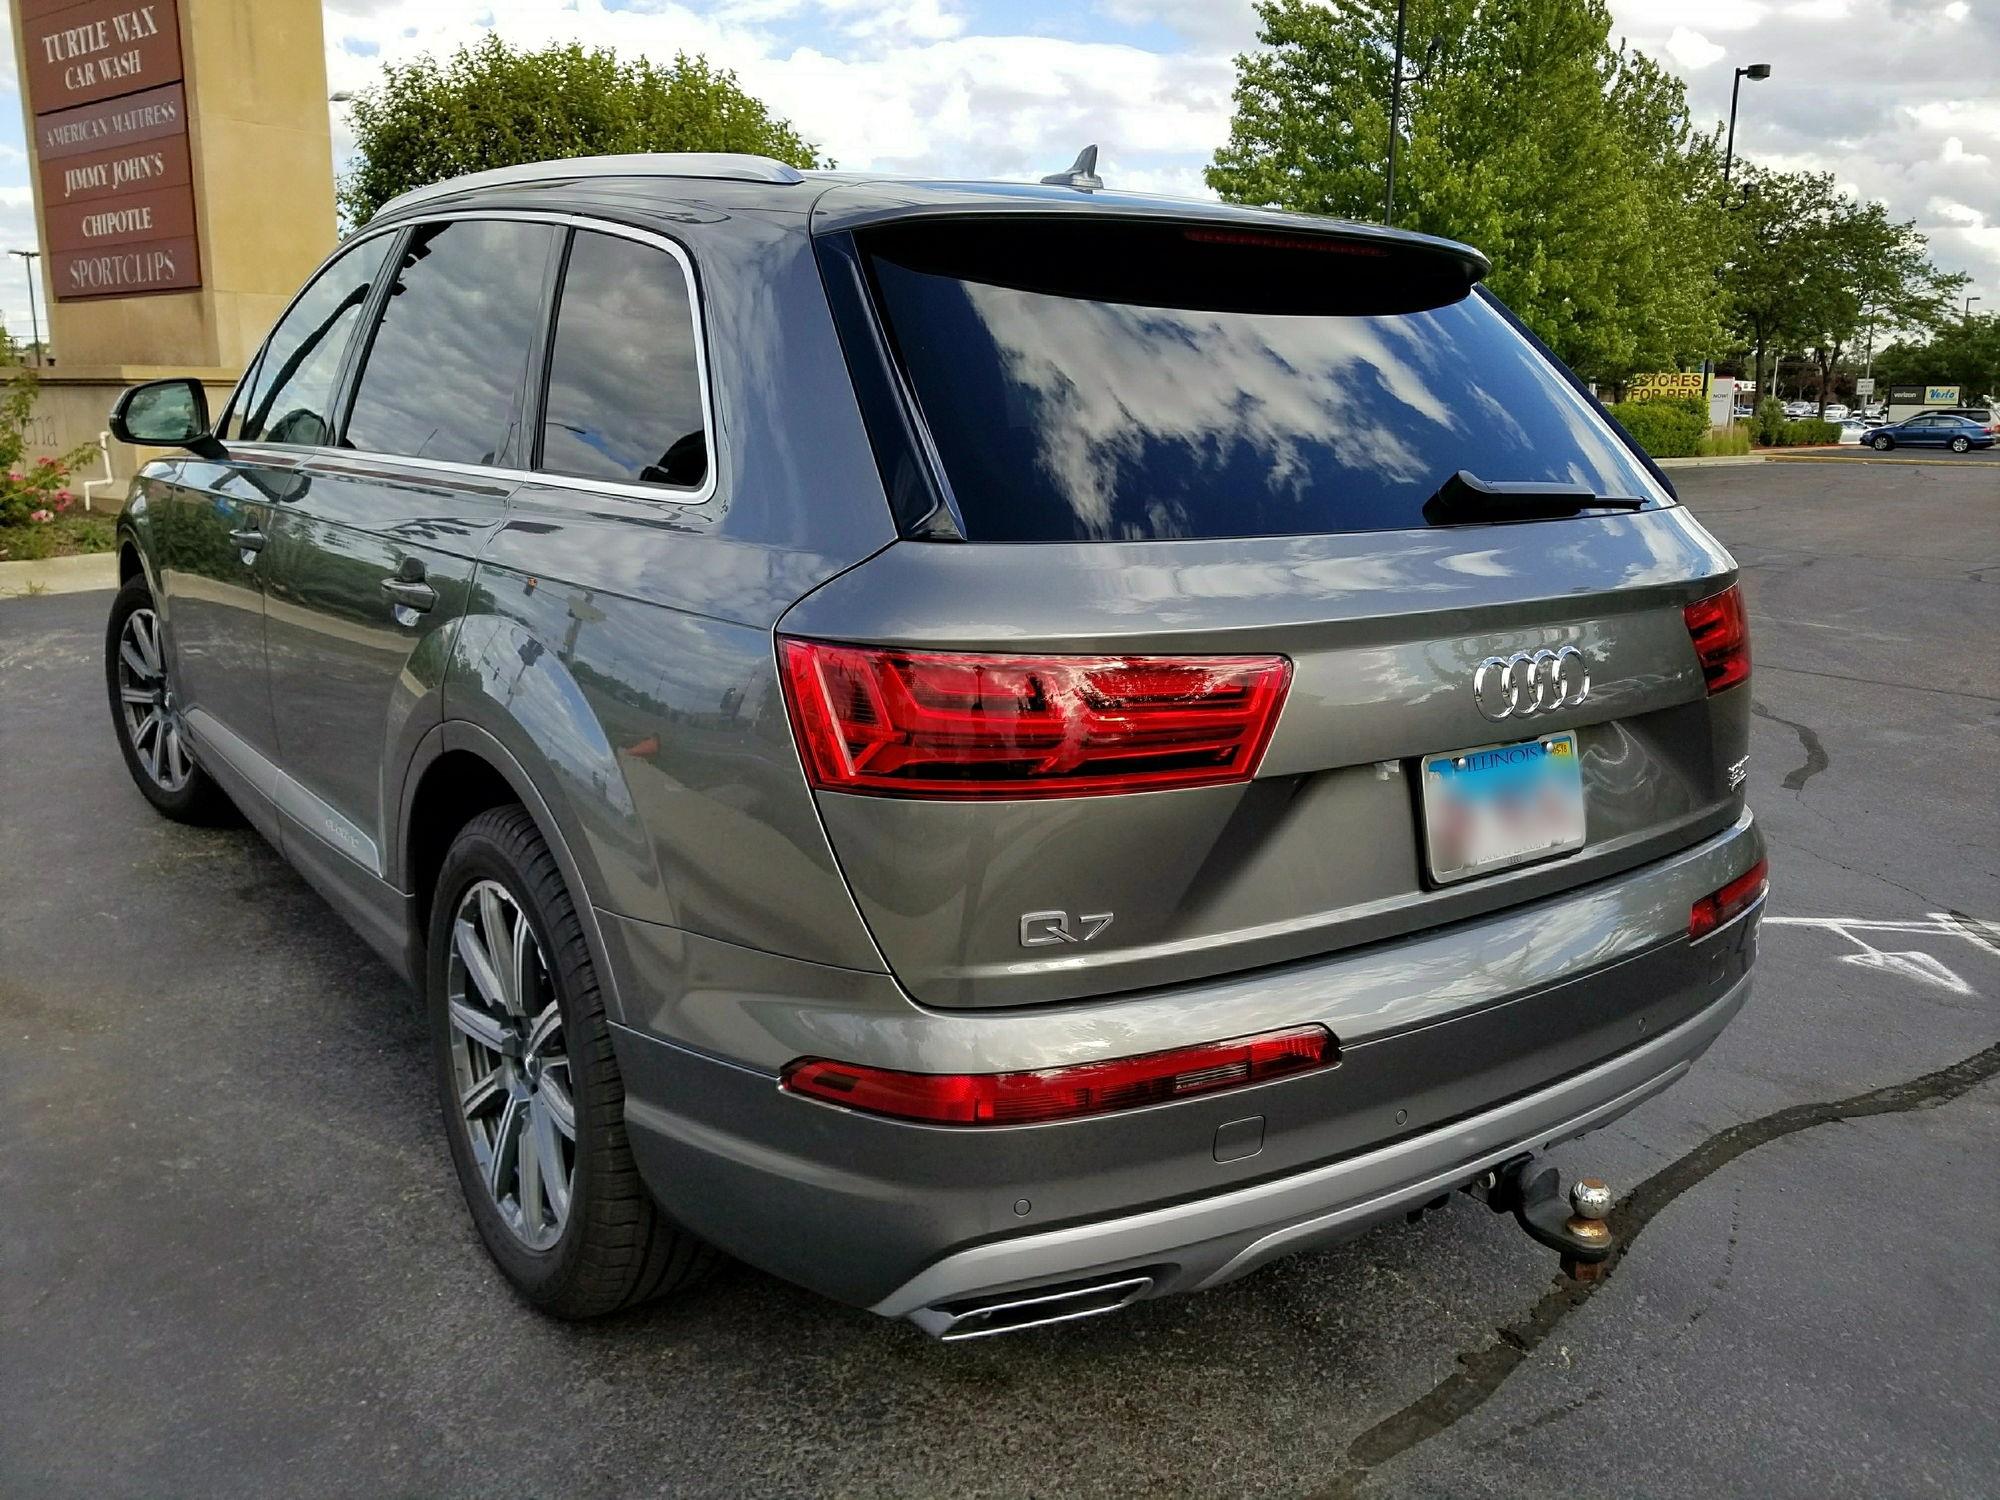 Audi Of Cherry Hill >> Graphite Gray Metallic w/ Cedar Brown Interior - Cherry Hill - AudiWorld Forums